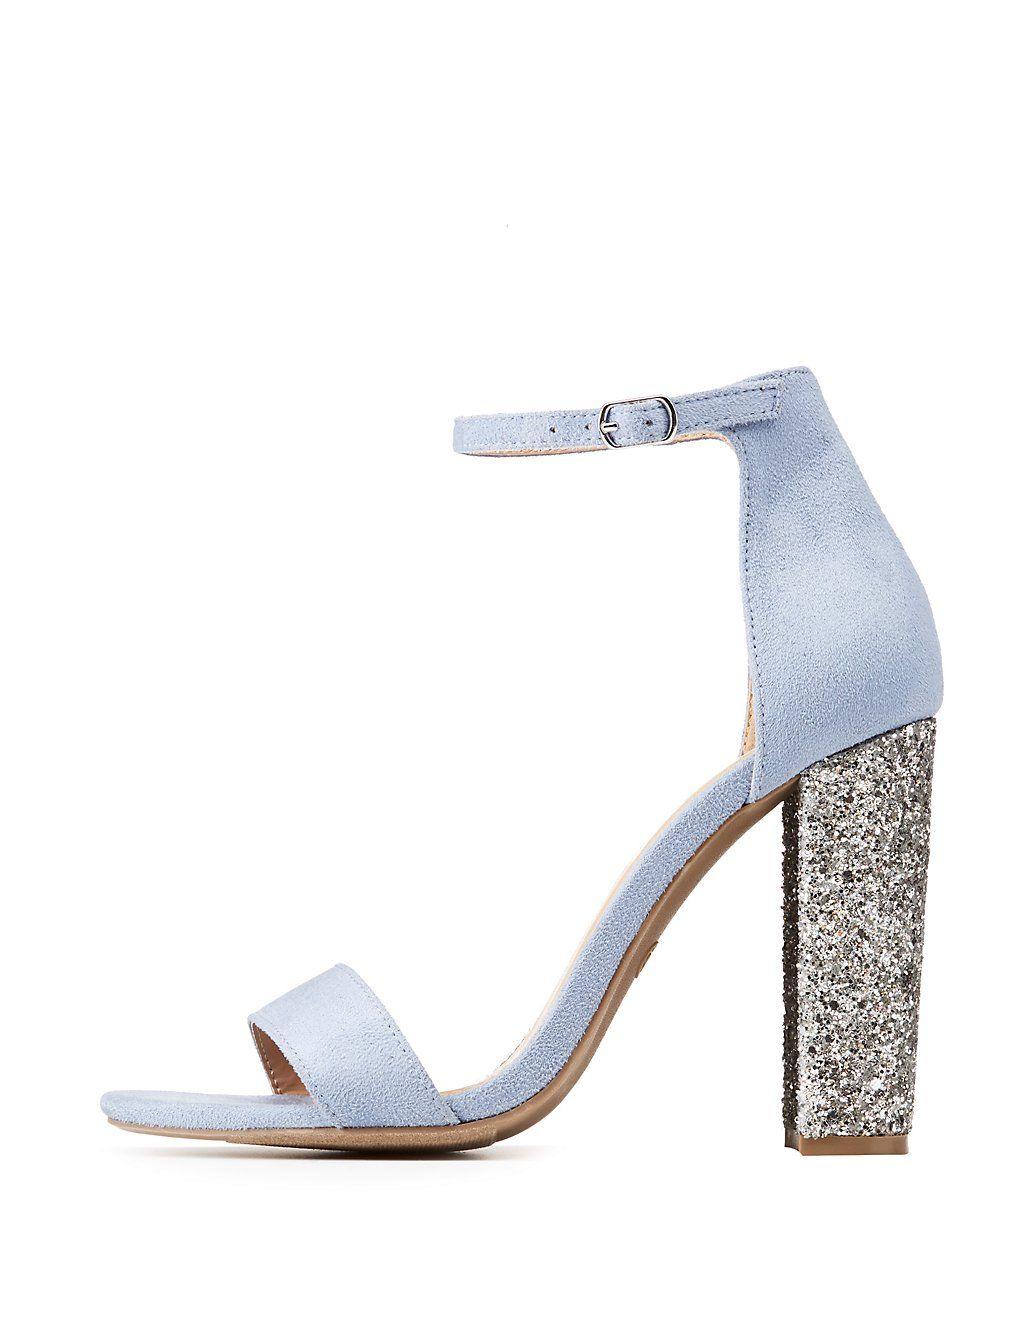 24f0937ae91 Ankle Strap Glitter Block Sandals